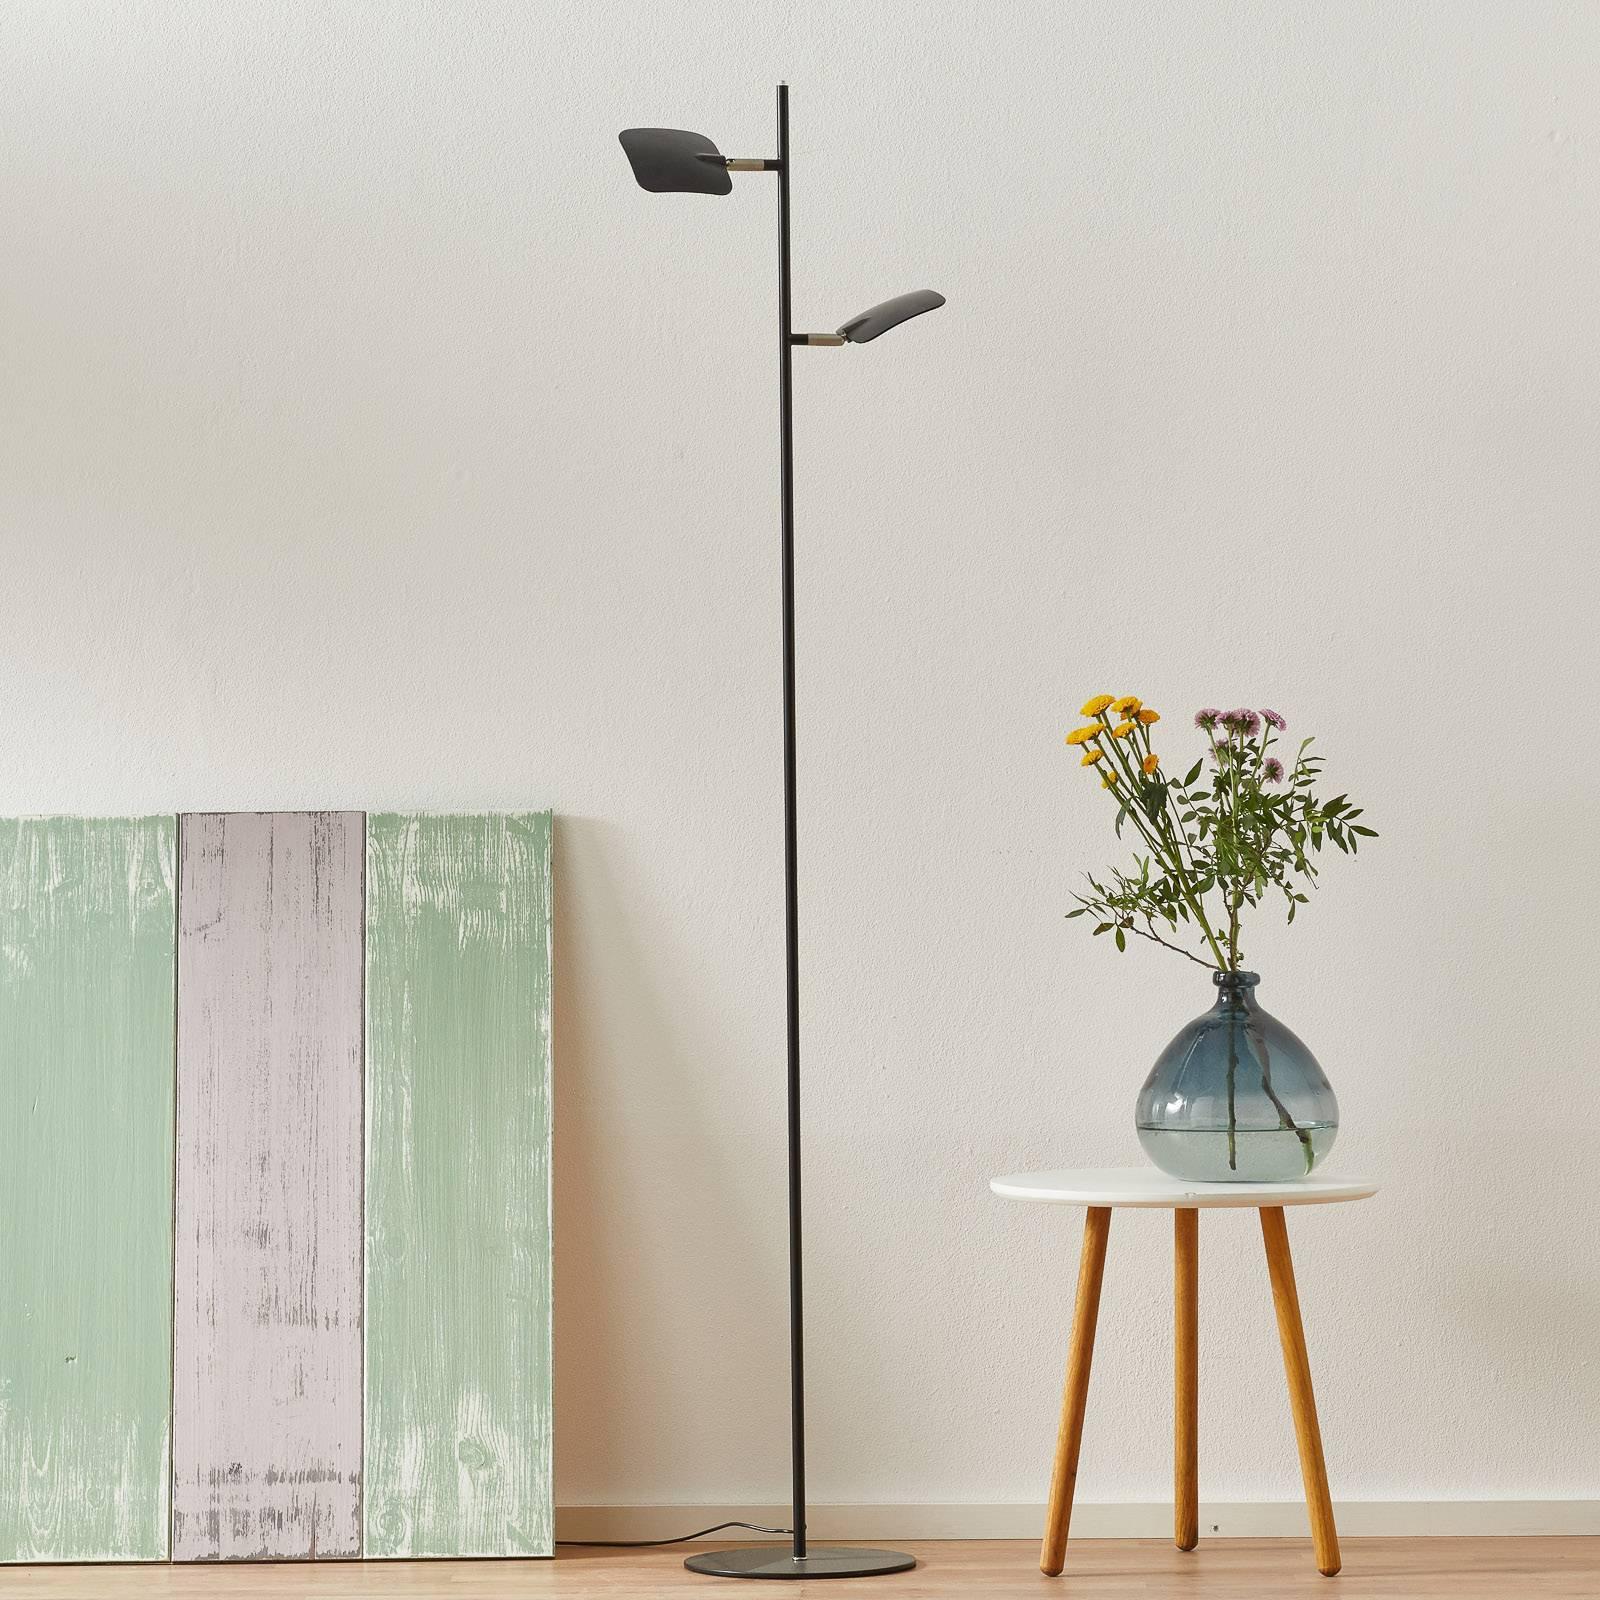 LED-gulvlampe Raggio, 2 lyskilder, svart